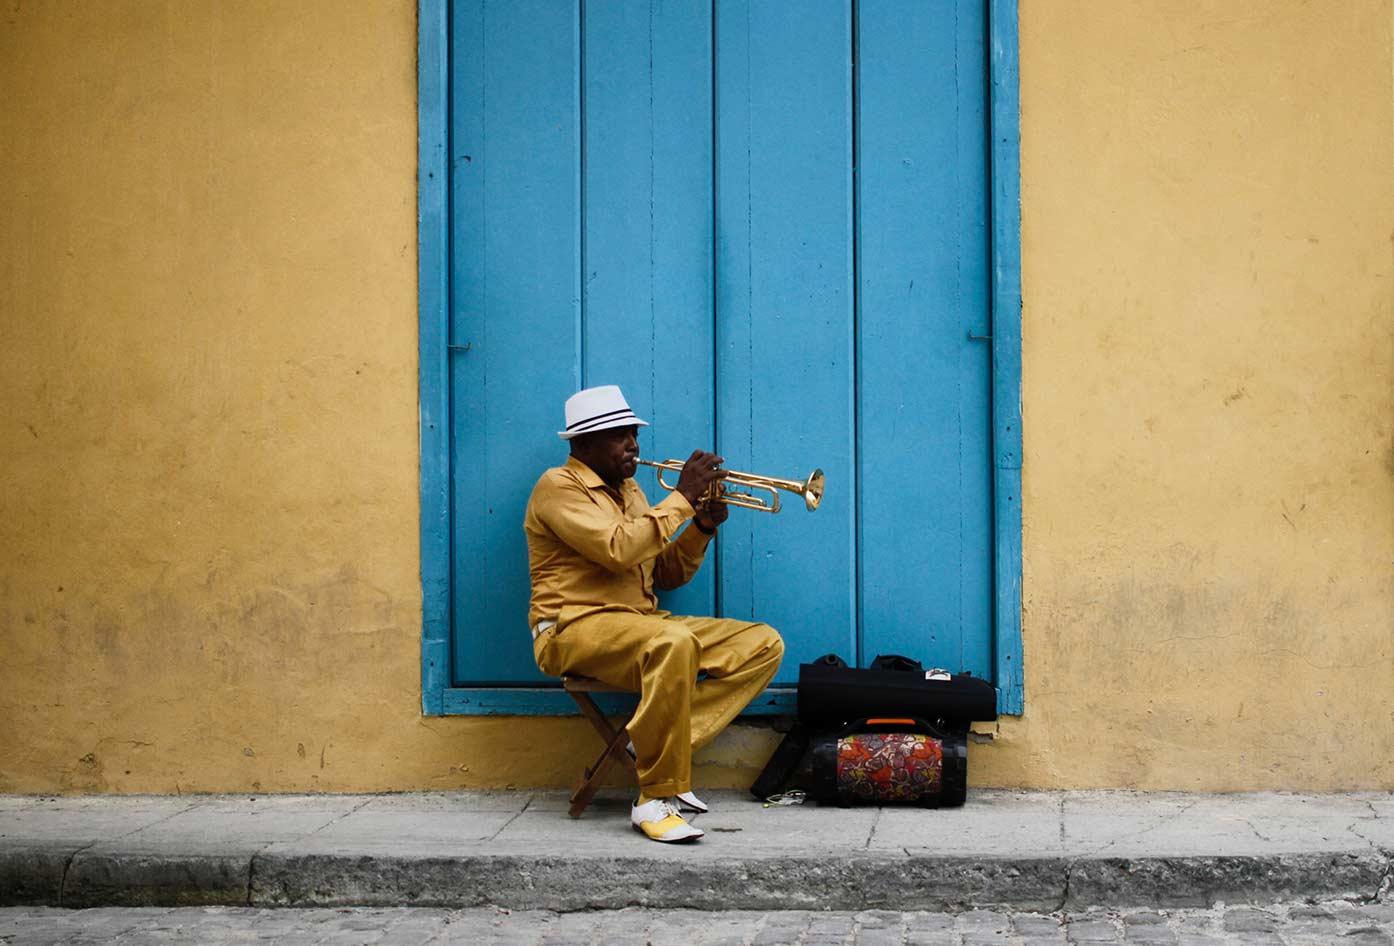 cuba street music